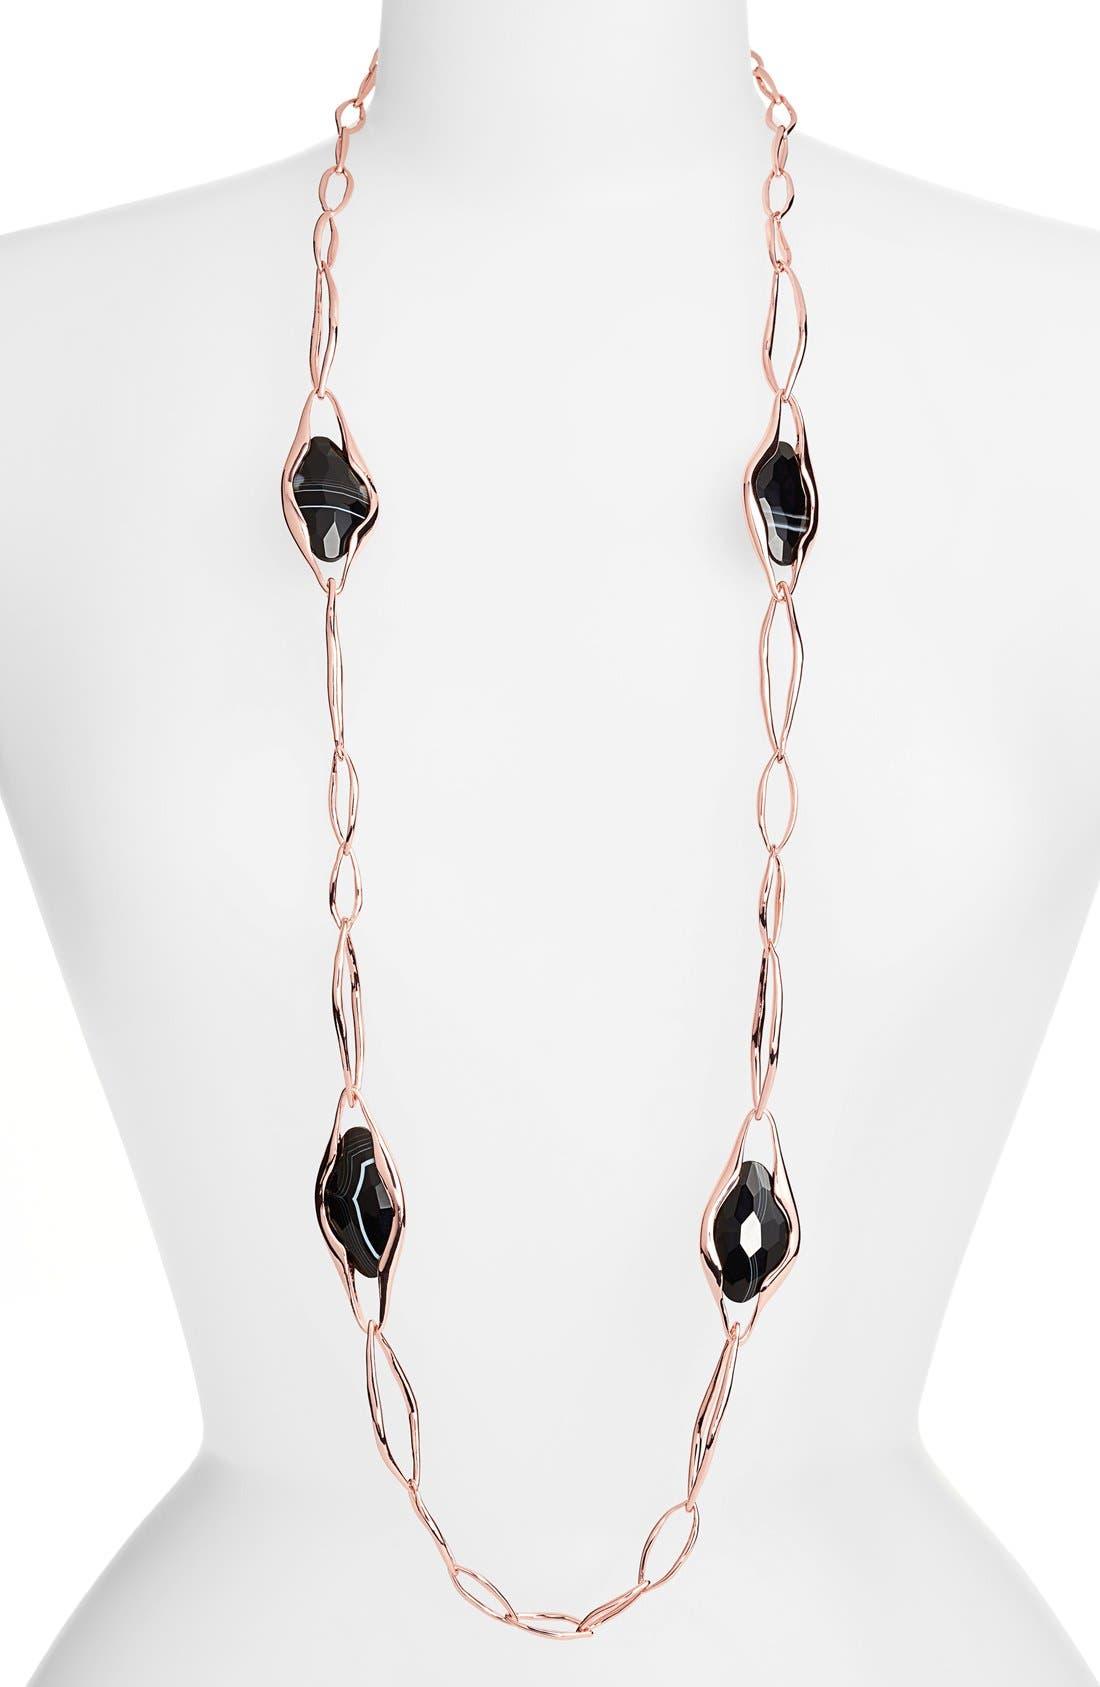 Alternate Image 1 Selected - Alexis Bittar 'Miss Havisham - Liquid' Long Link Necklace